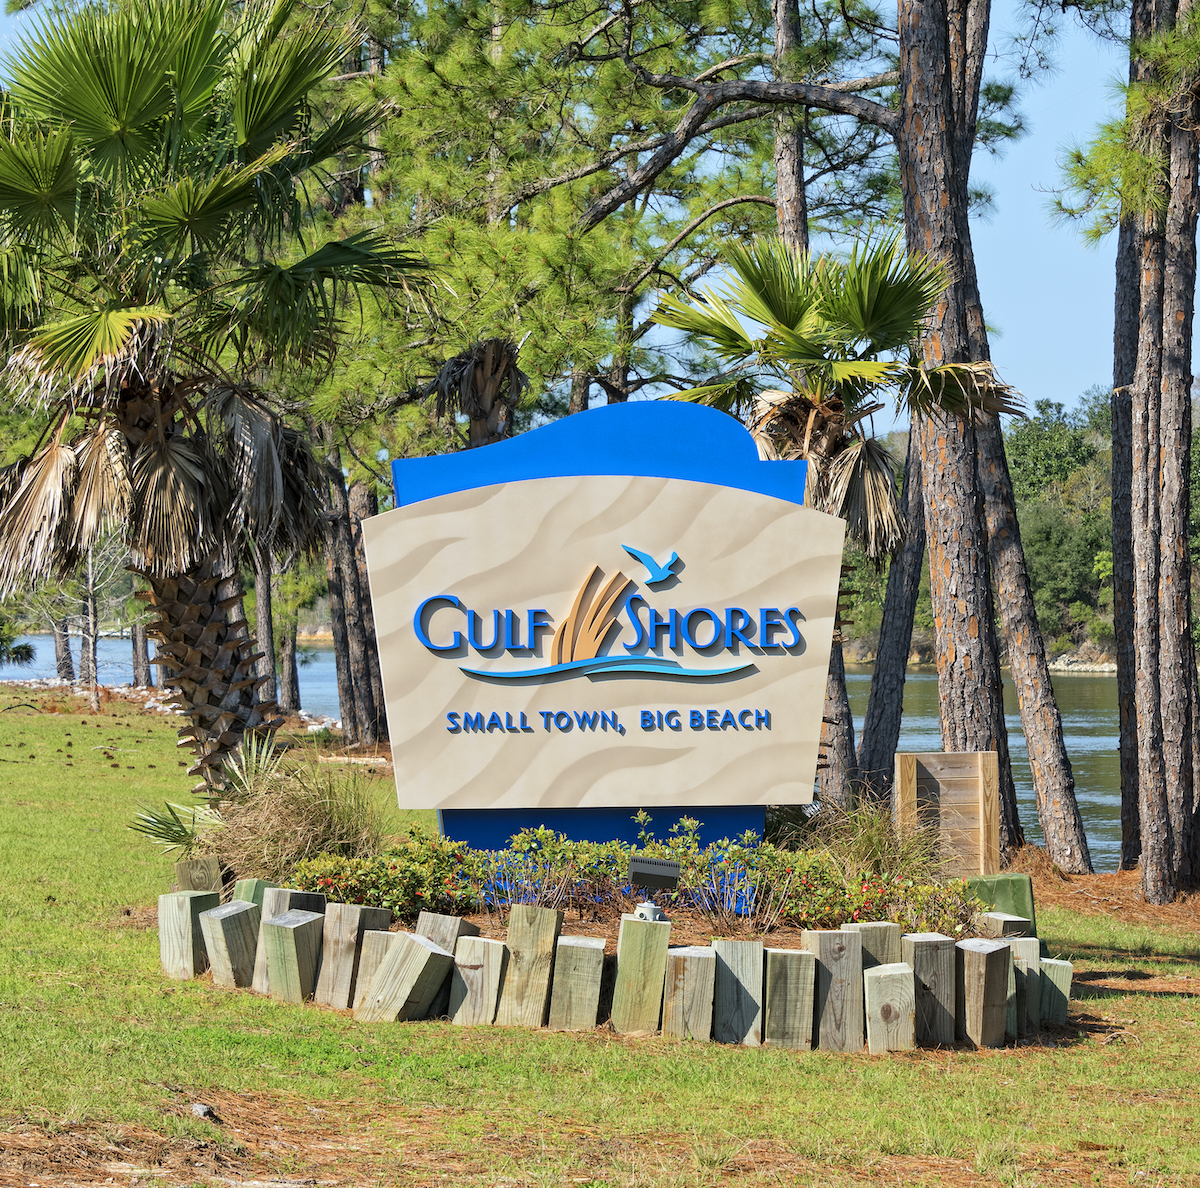 A sign for Gulf Shores, AL.